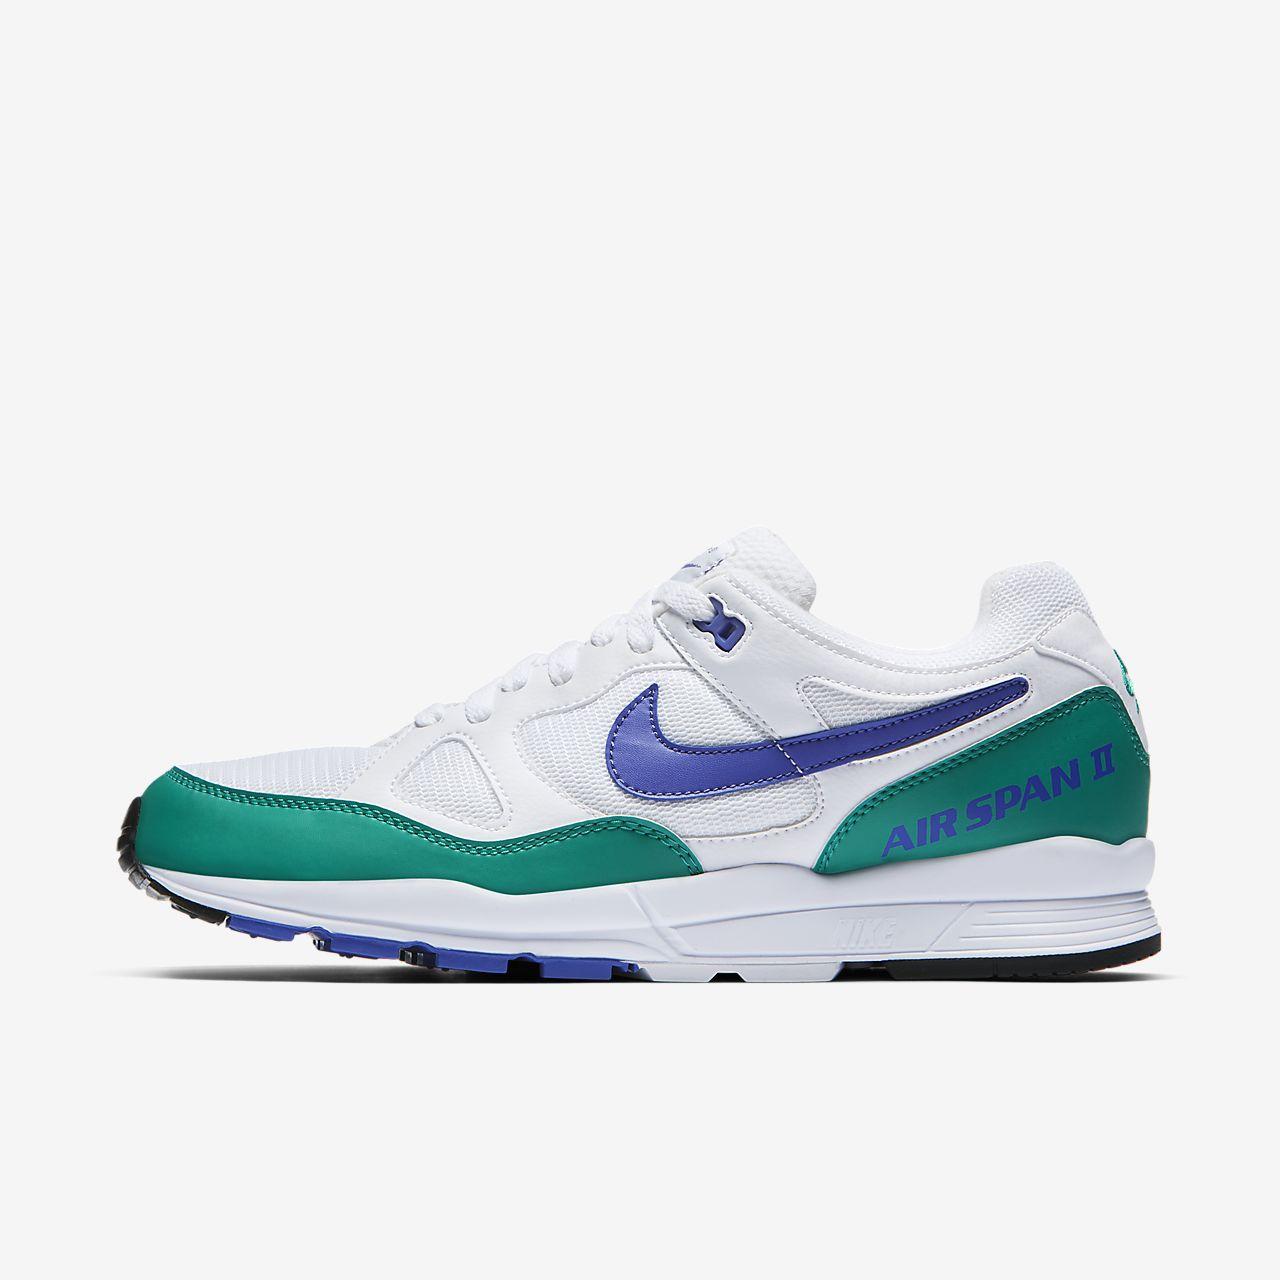 112b1ecc9dd Nike Air Span II Men s Shoe. Nike.com LU